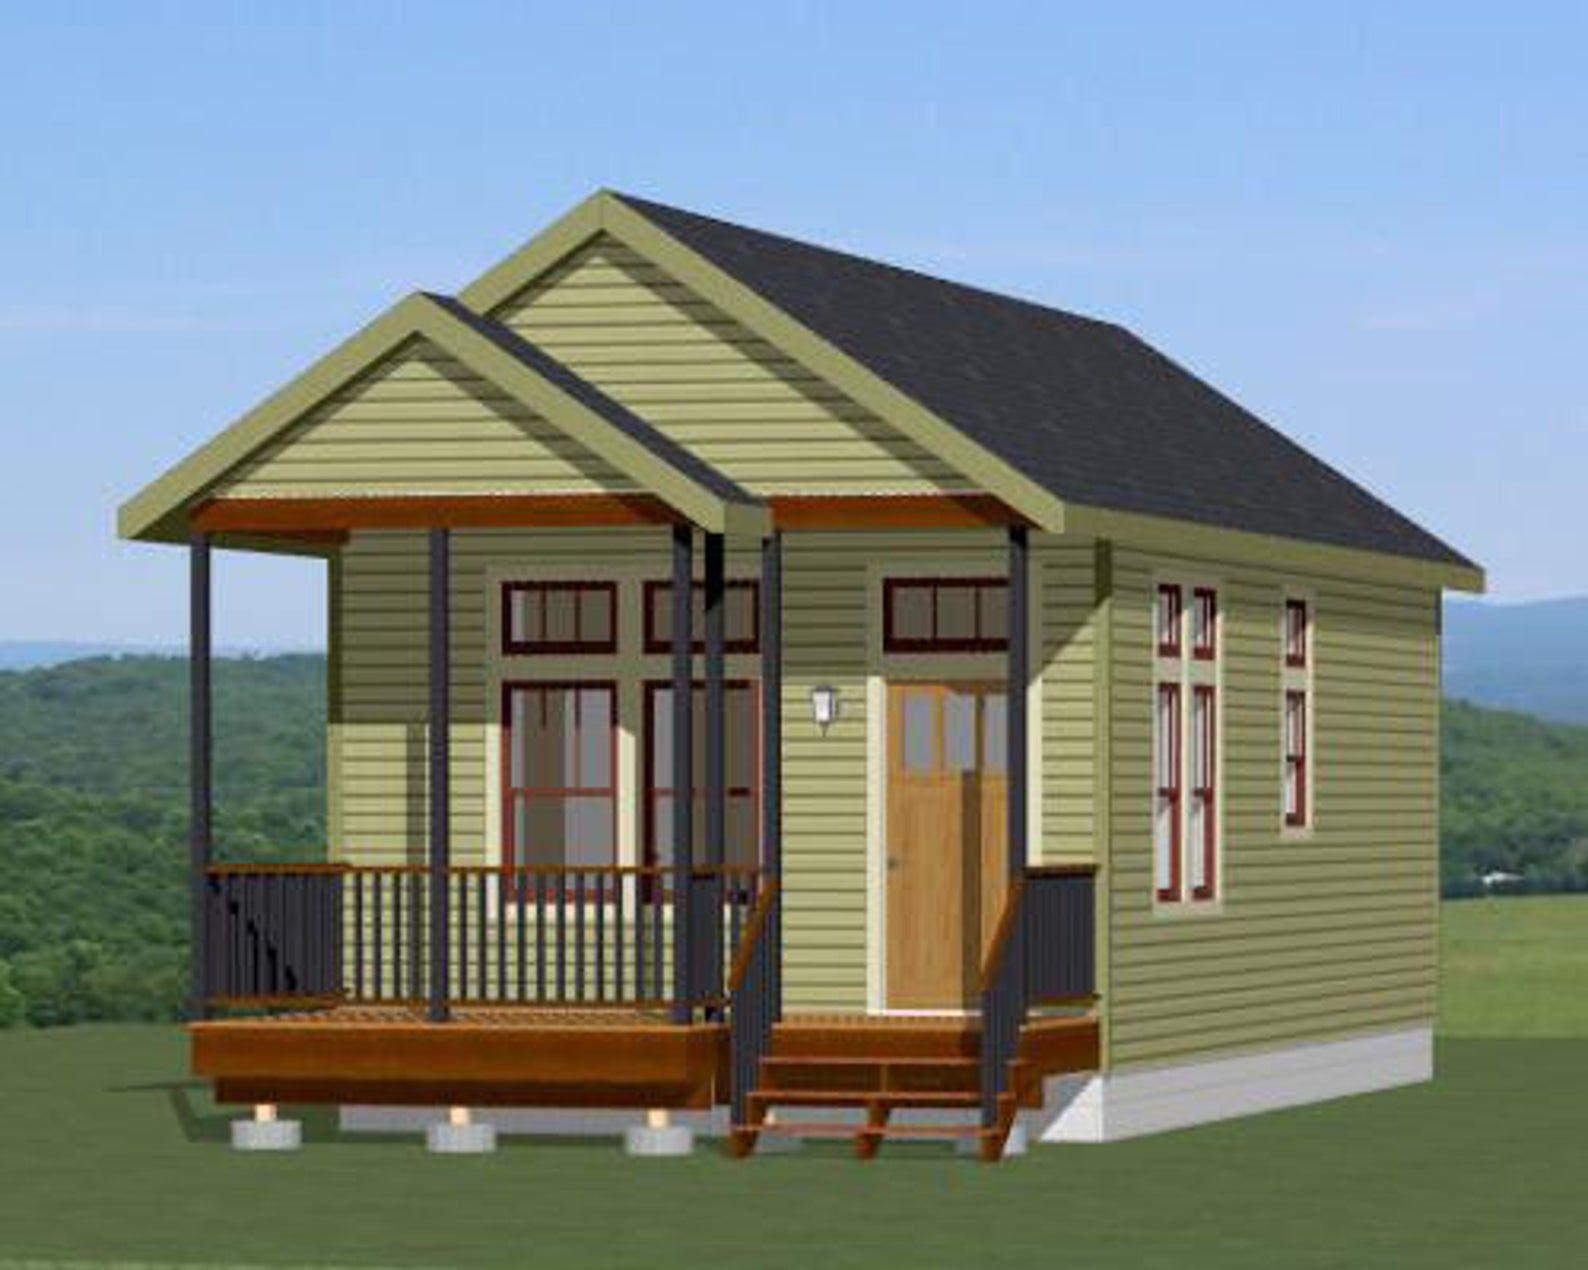 16x32 House 1 Bedroom 1 Bath 511 sq ft PDF Floor Plan Instant Download Model 1D